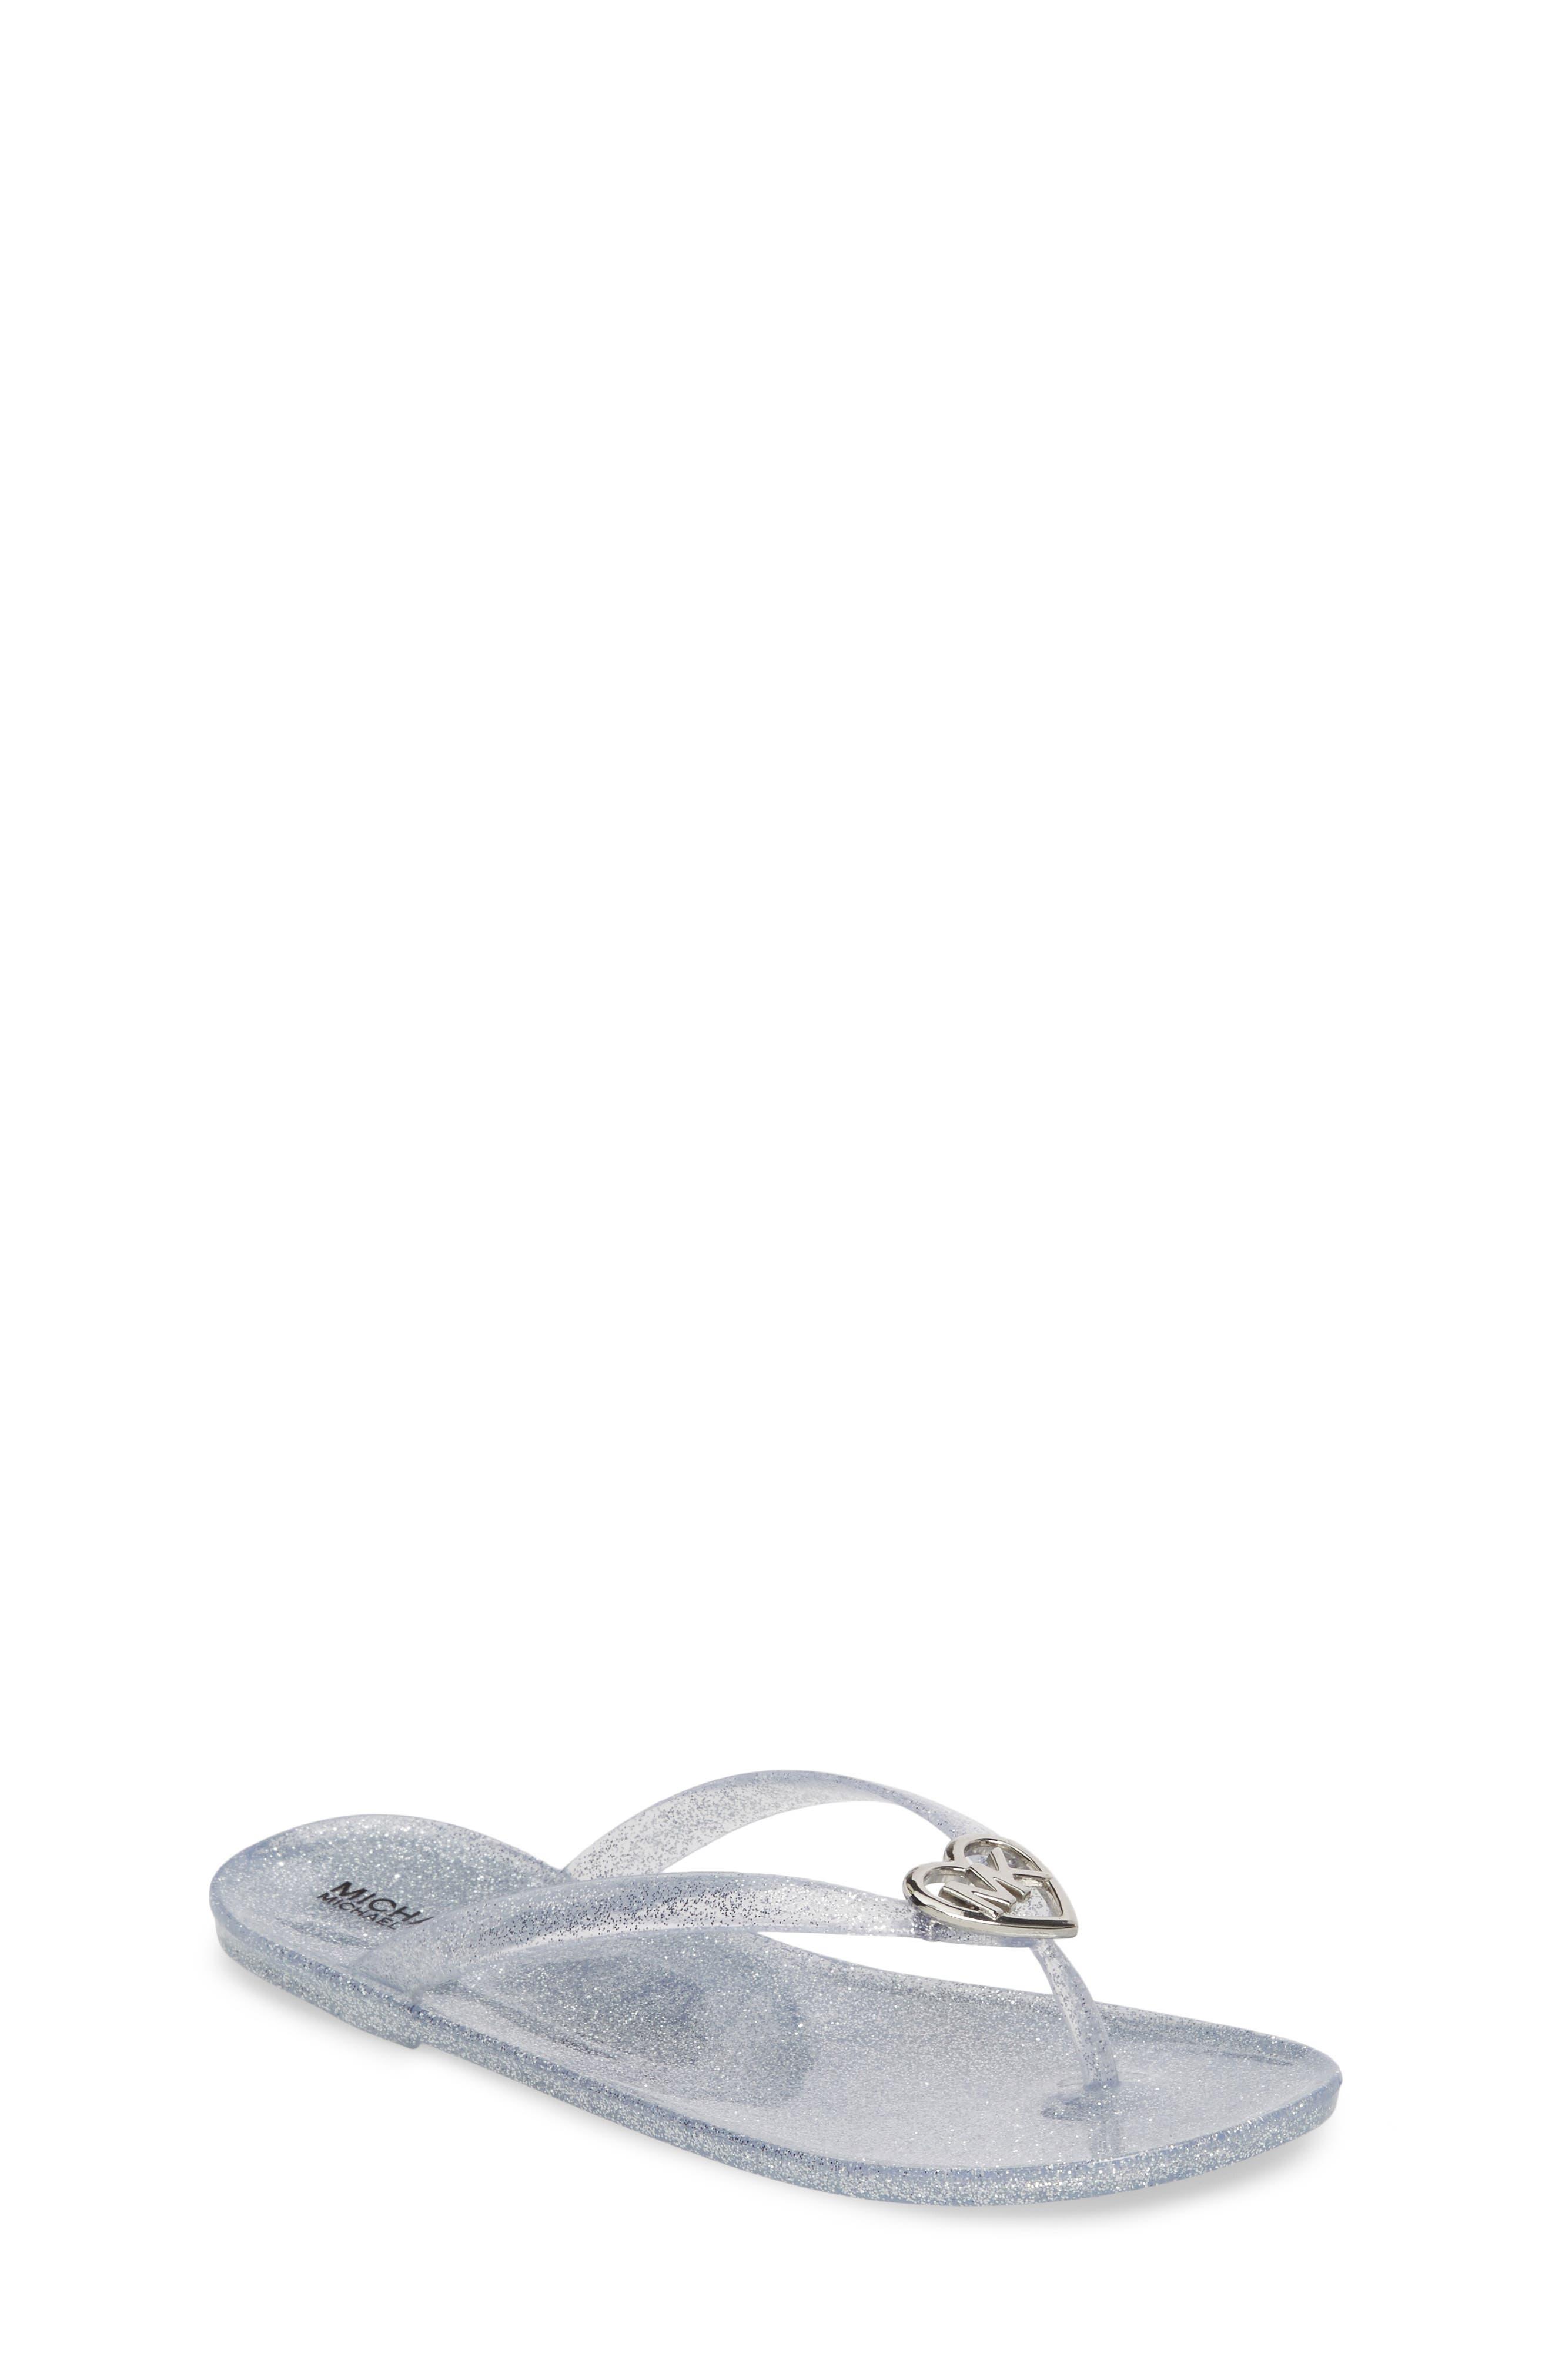 Trish Glare Glitter Flip Flop,                             Main thumbnail 1, color,                             Silver Glitter